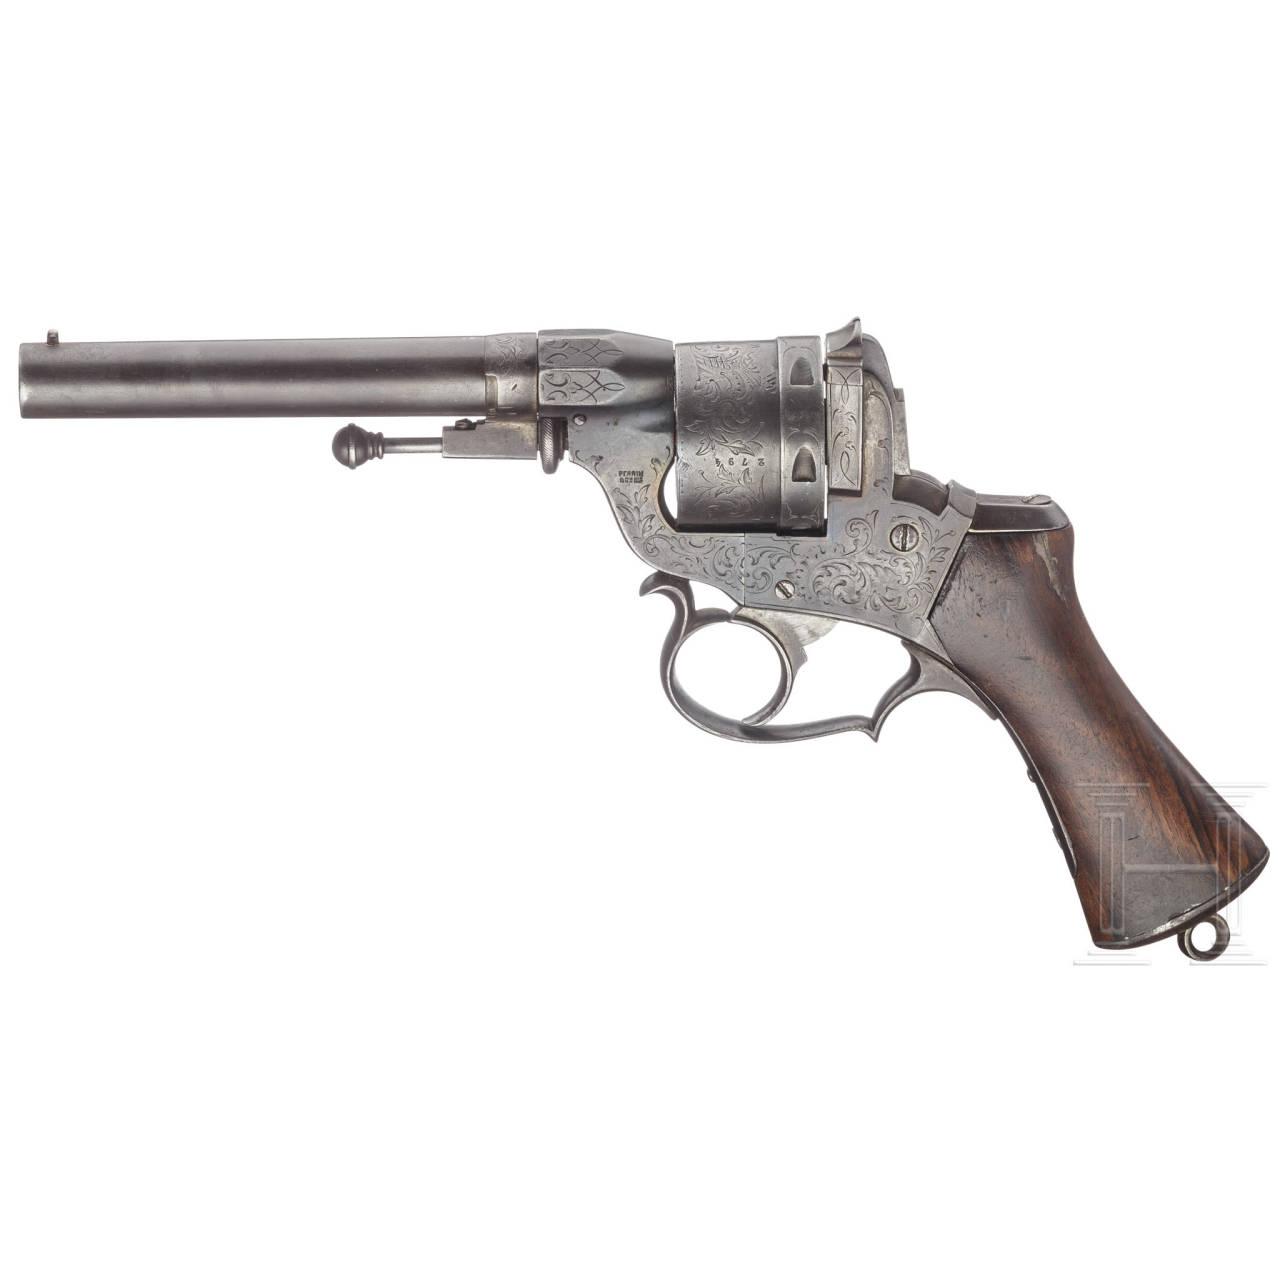 A Perrin model 1859 revolver, 2nd version